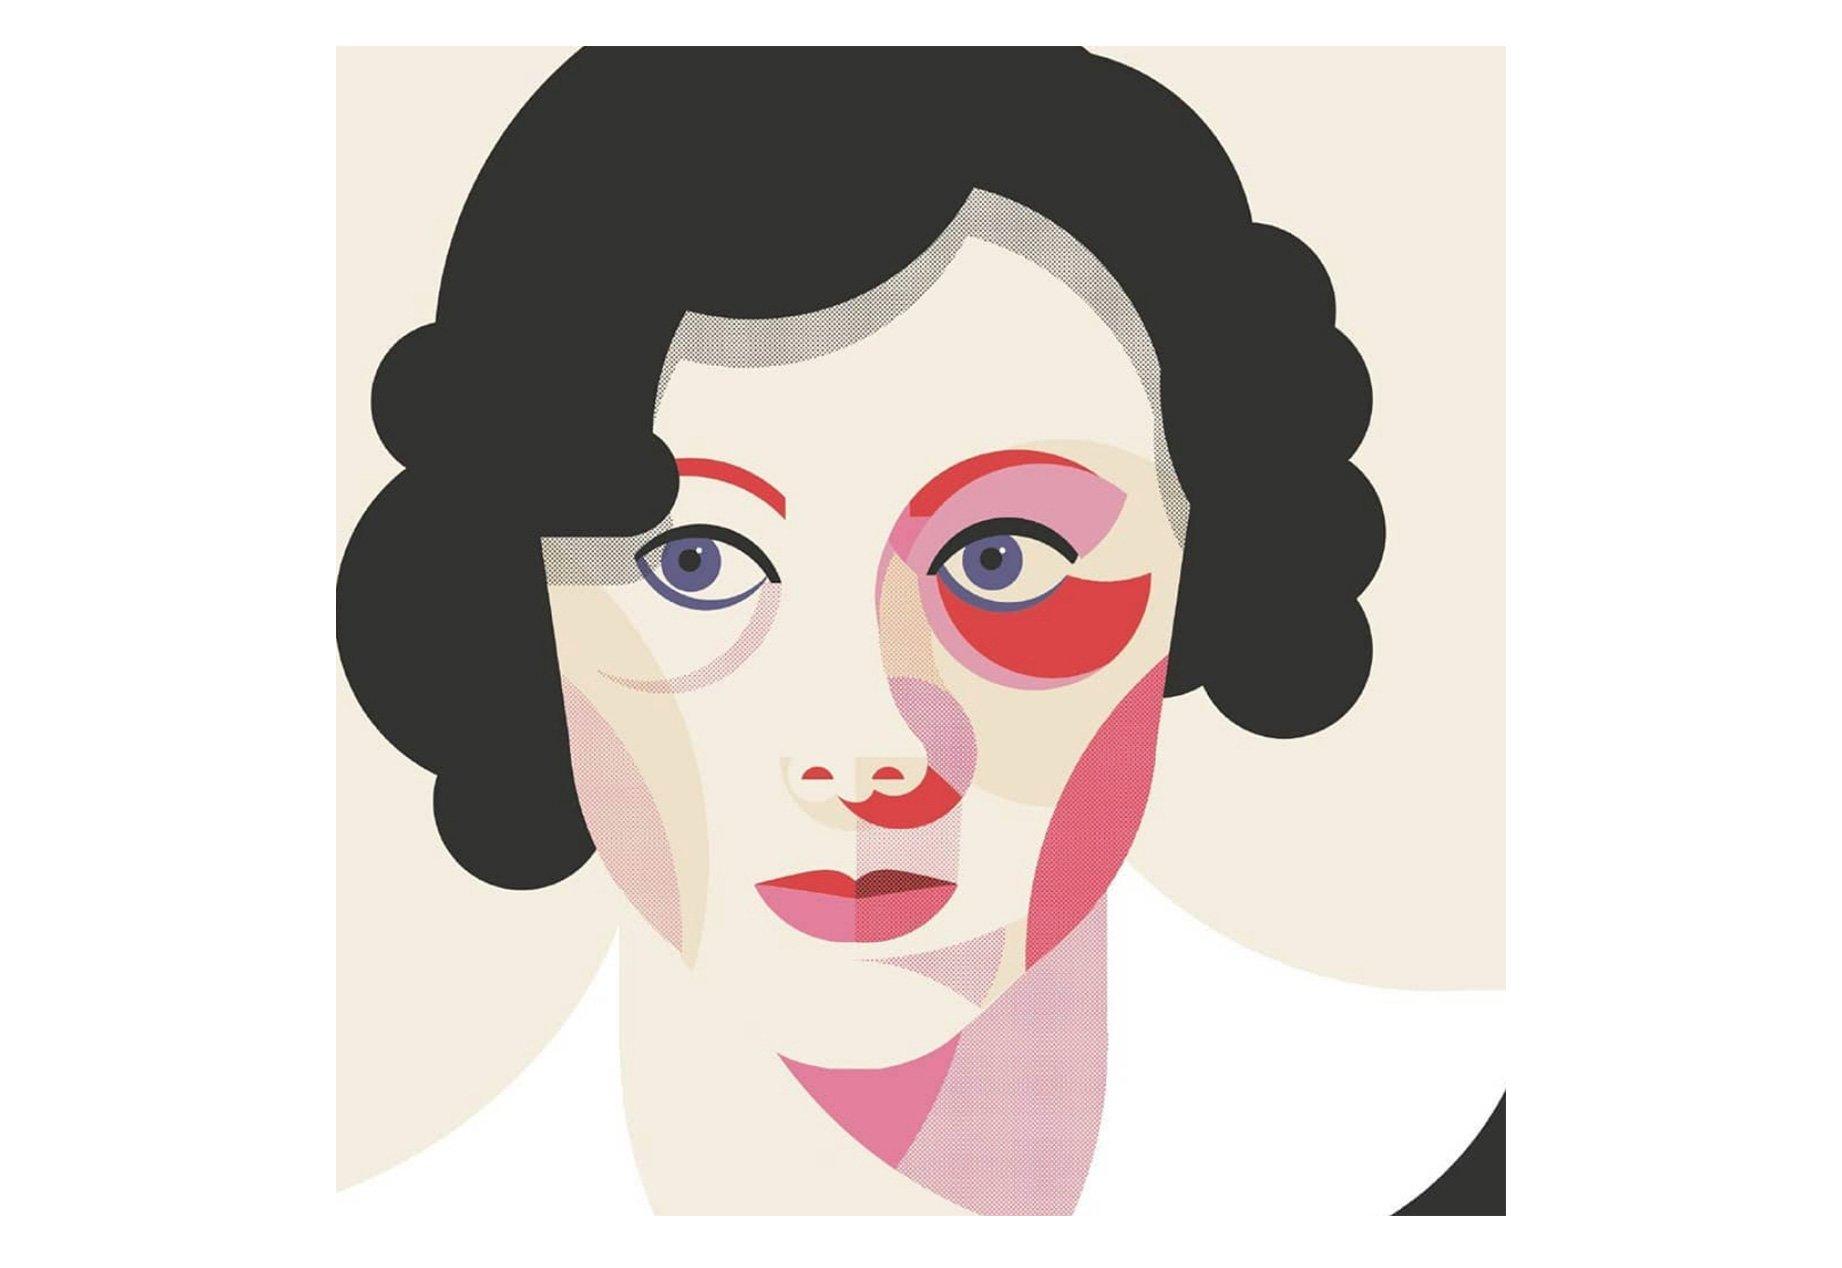 jenny-agutter-portrait-alice-iuri